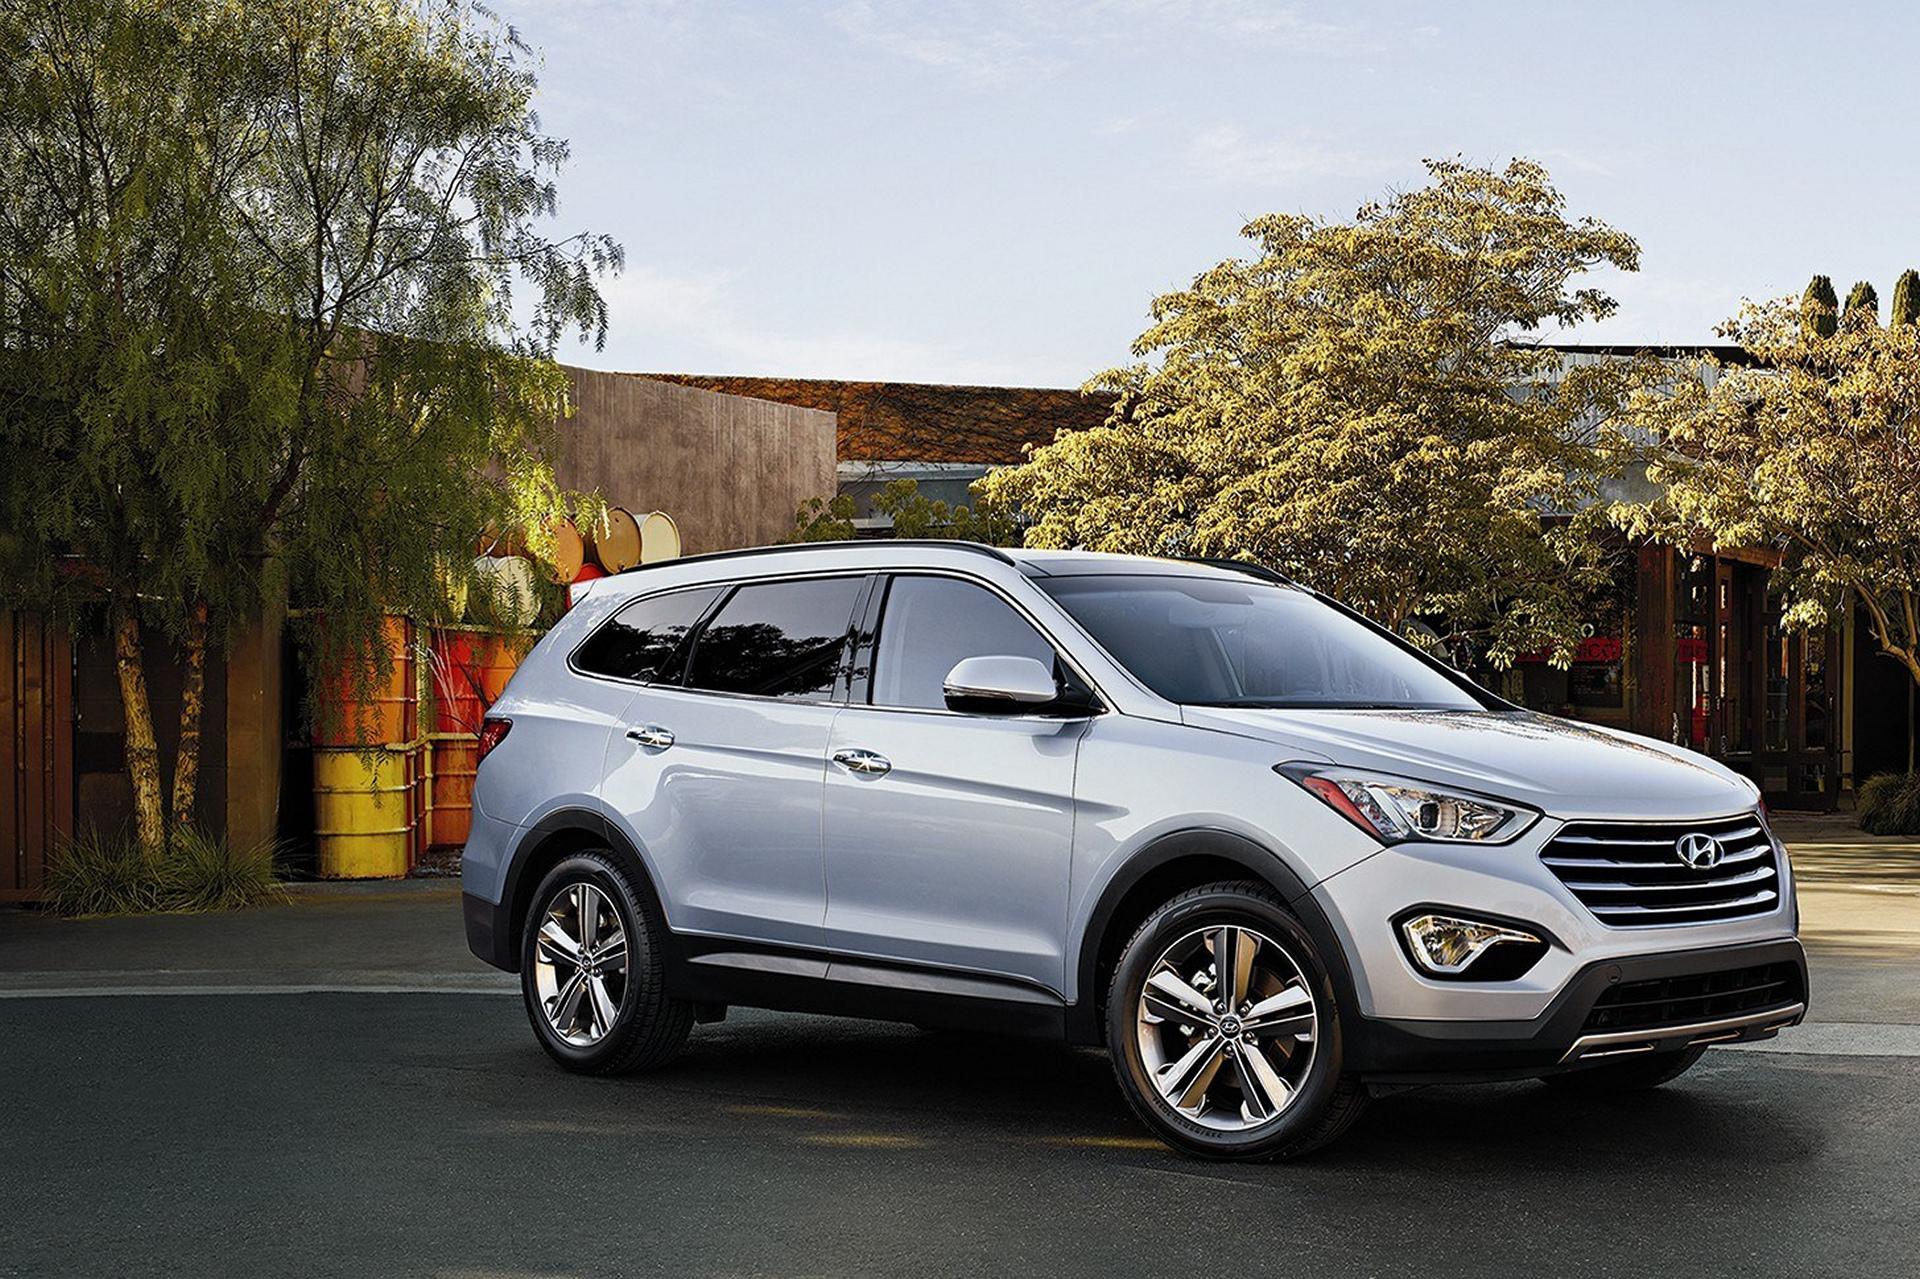 2016 Hyundai Santa Fe Review - Carrrs Auto Portal